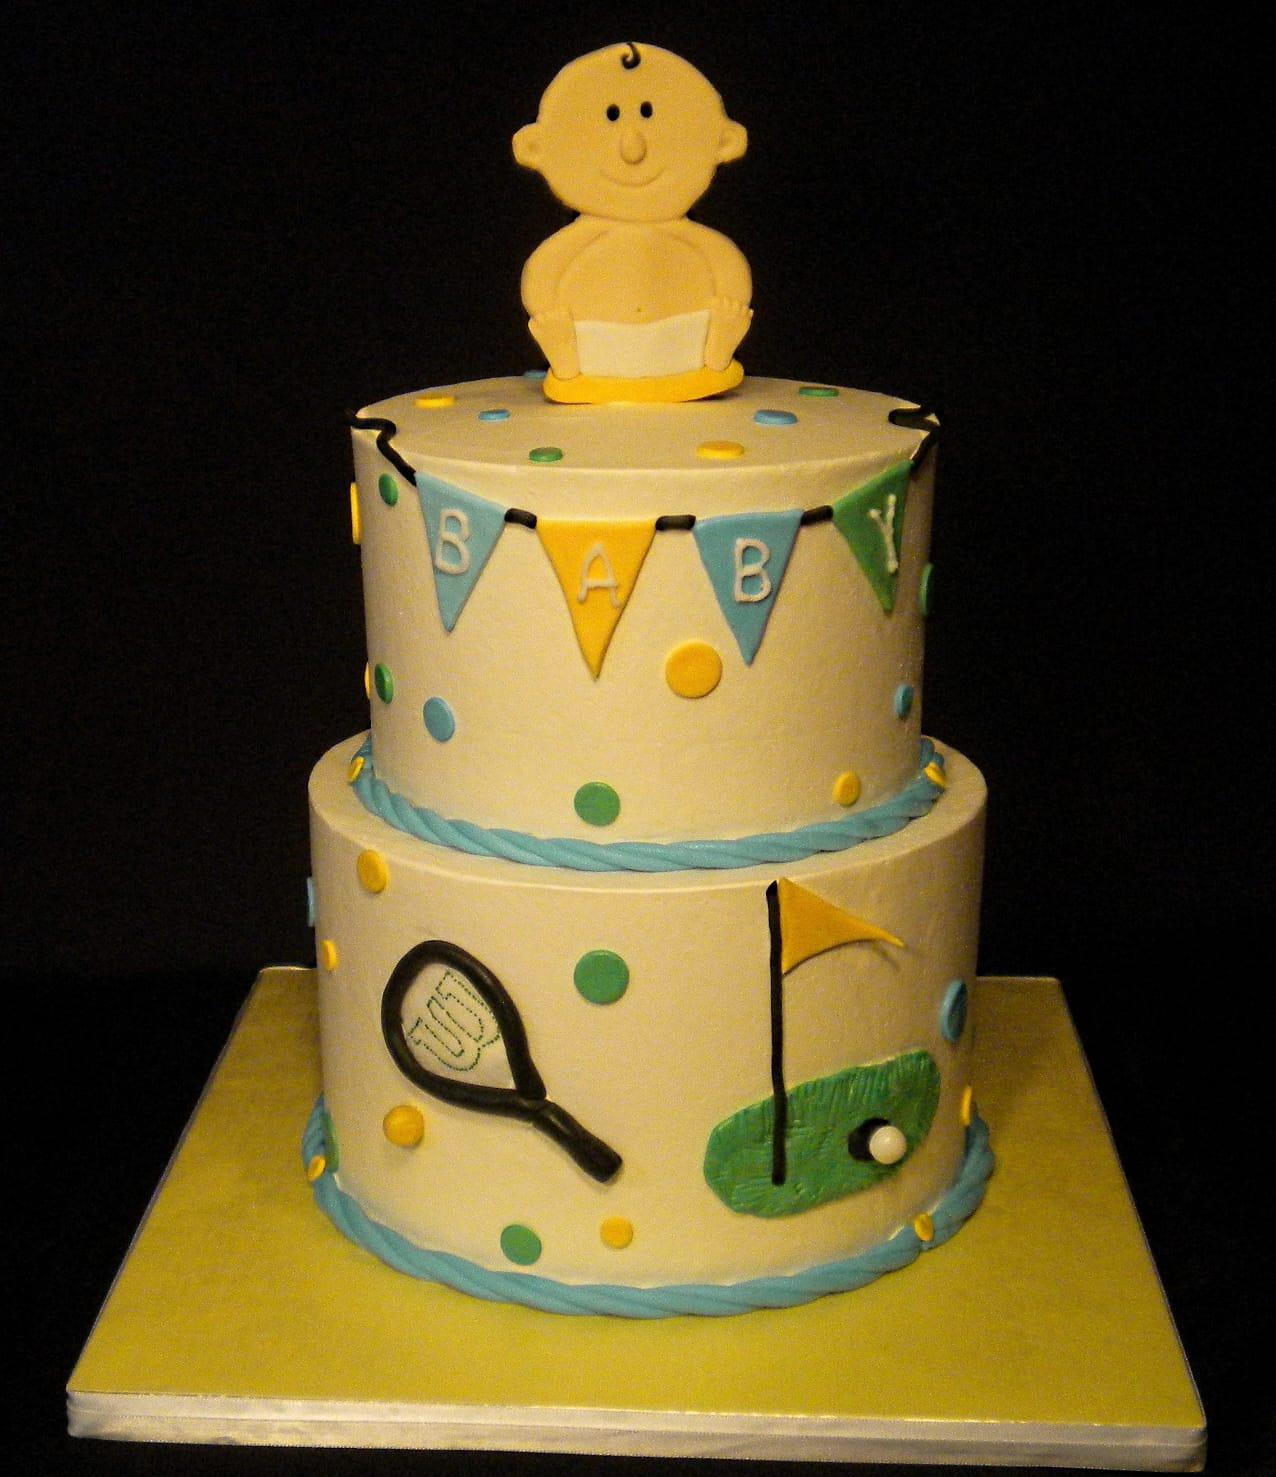 Baby on Cake